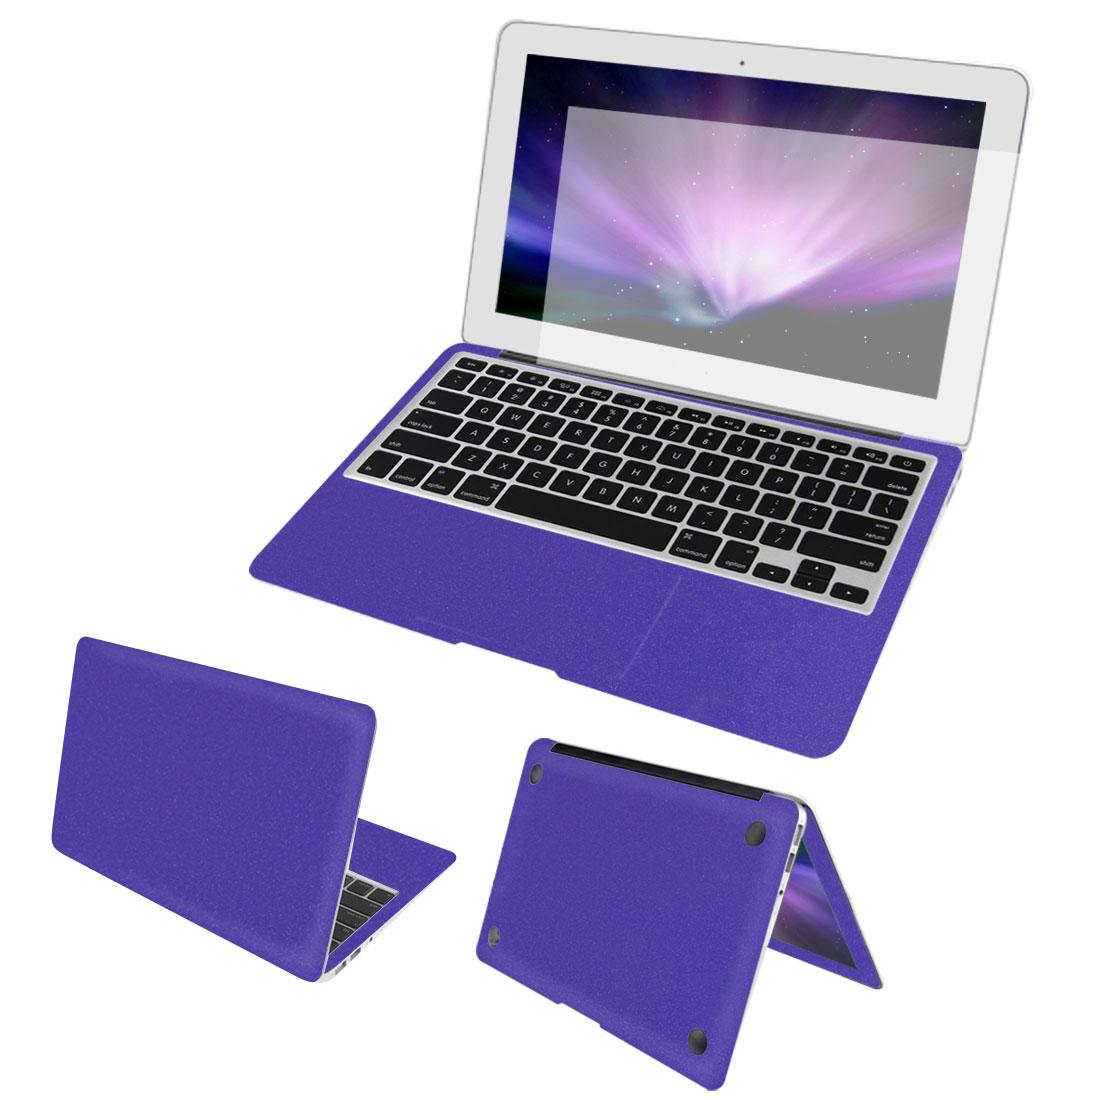 "Purple Full Body Wrap Protector Decal Skin Screen Guard for Macbook Pro 15"""